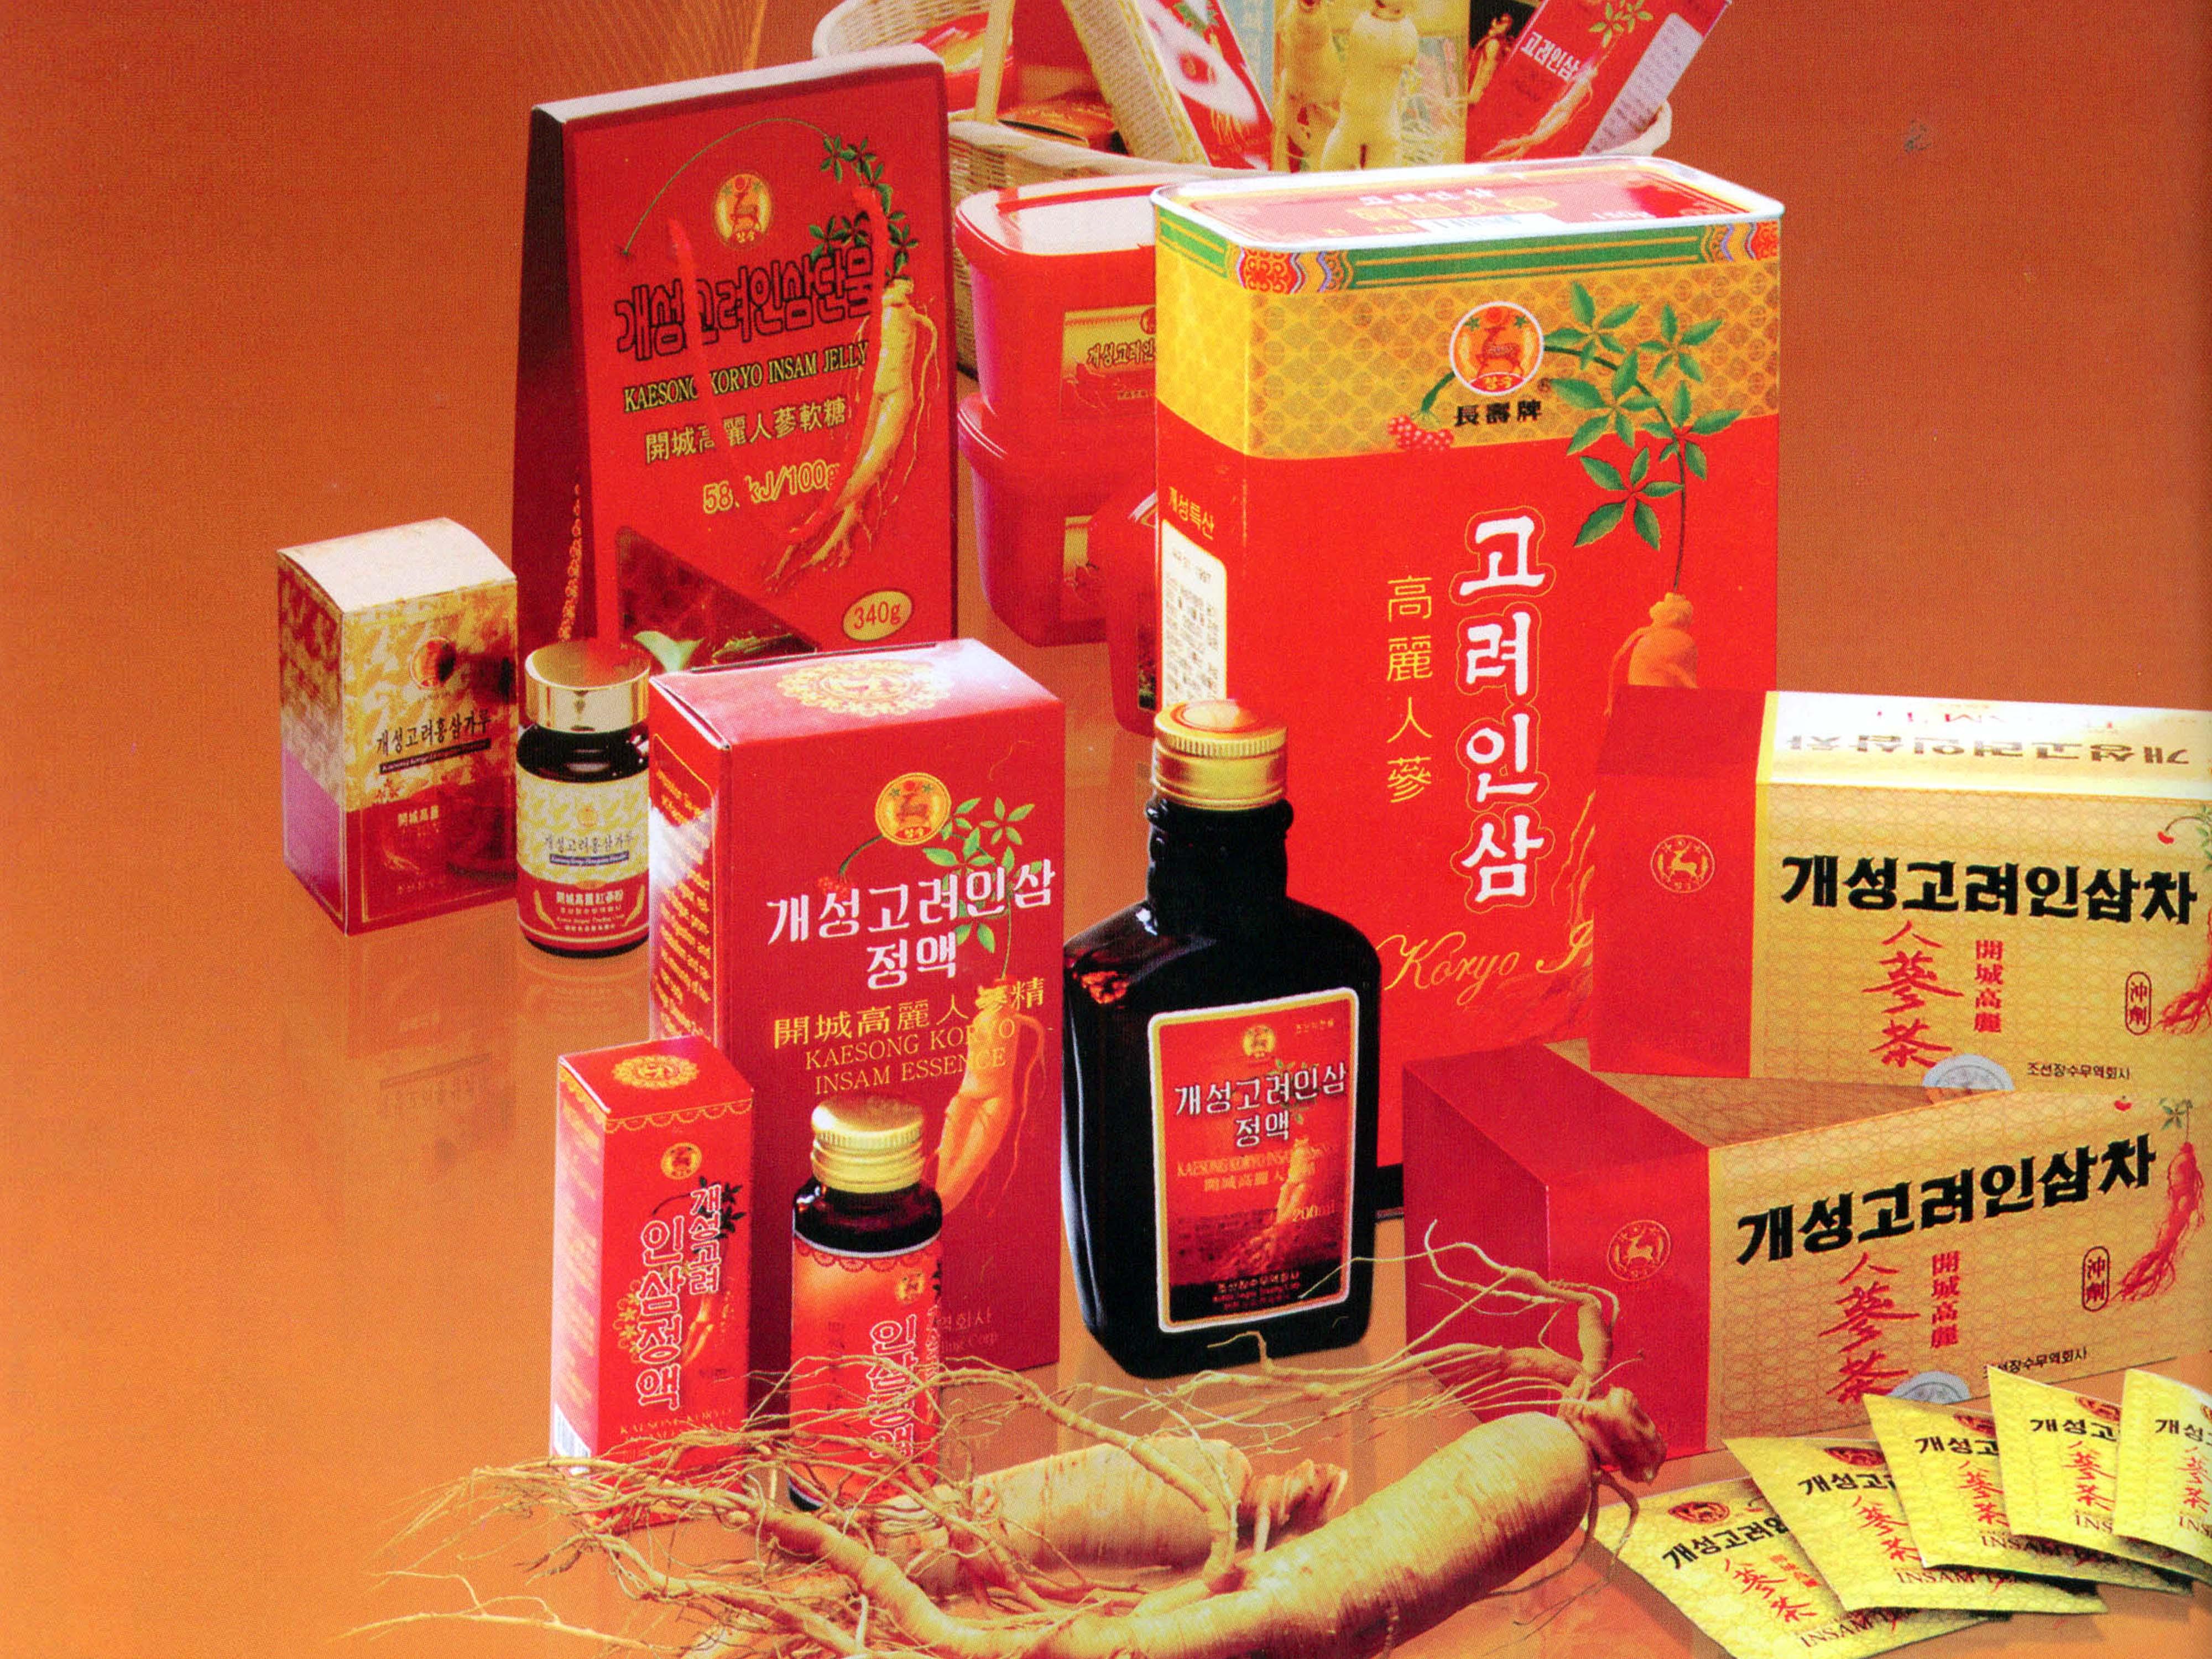 Korea Jangsu Trading Corporation